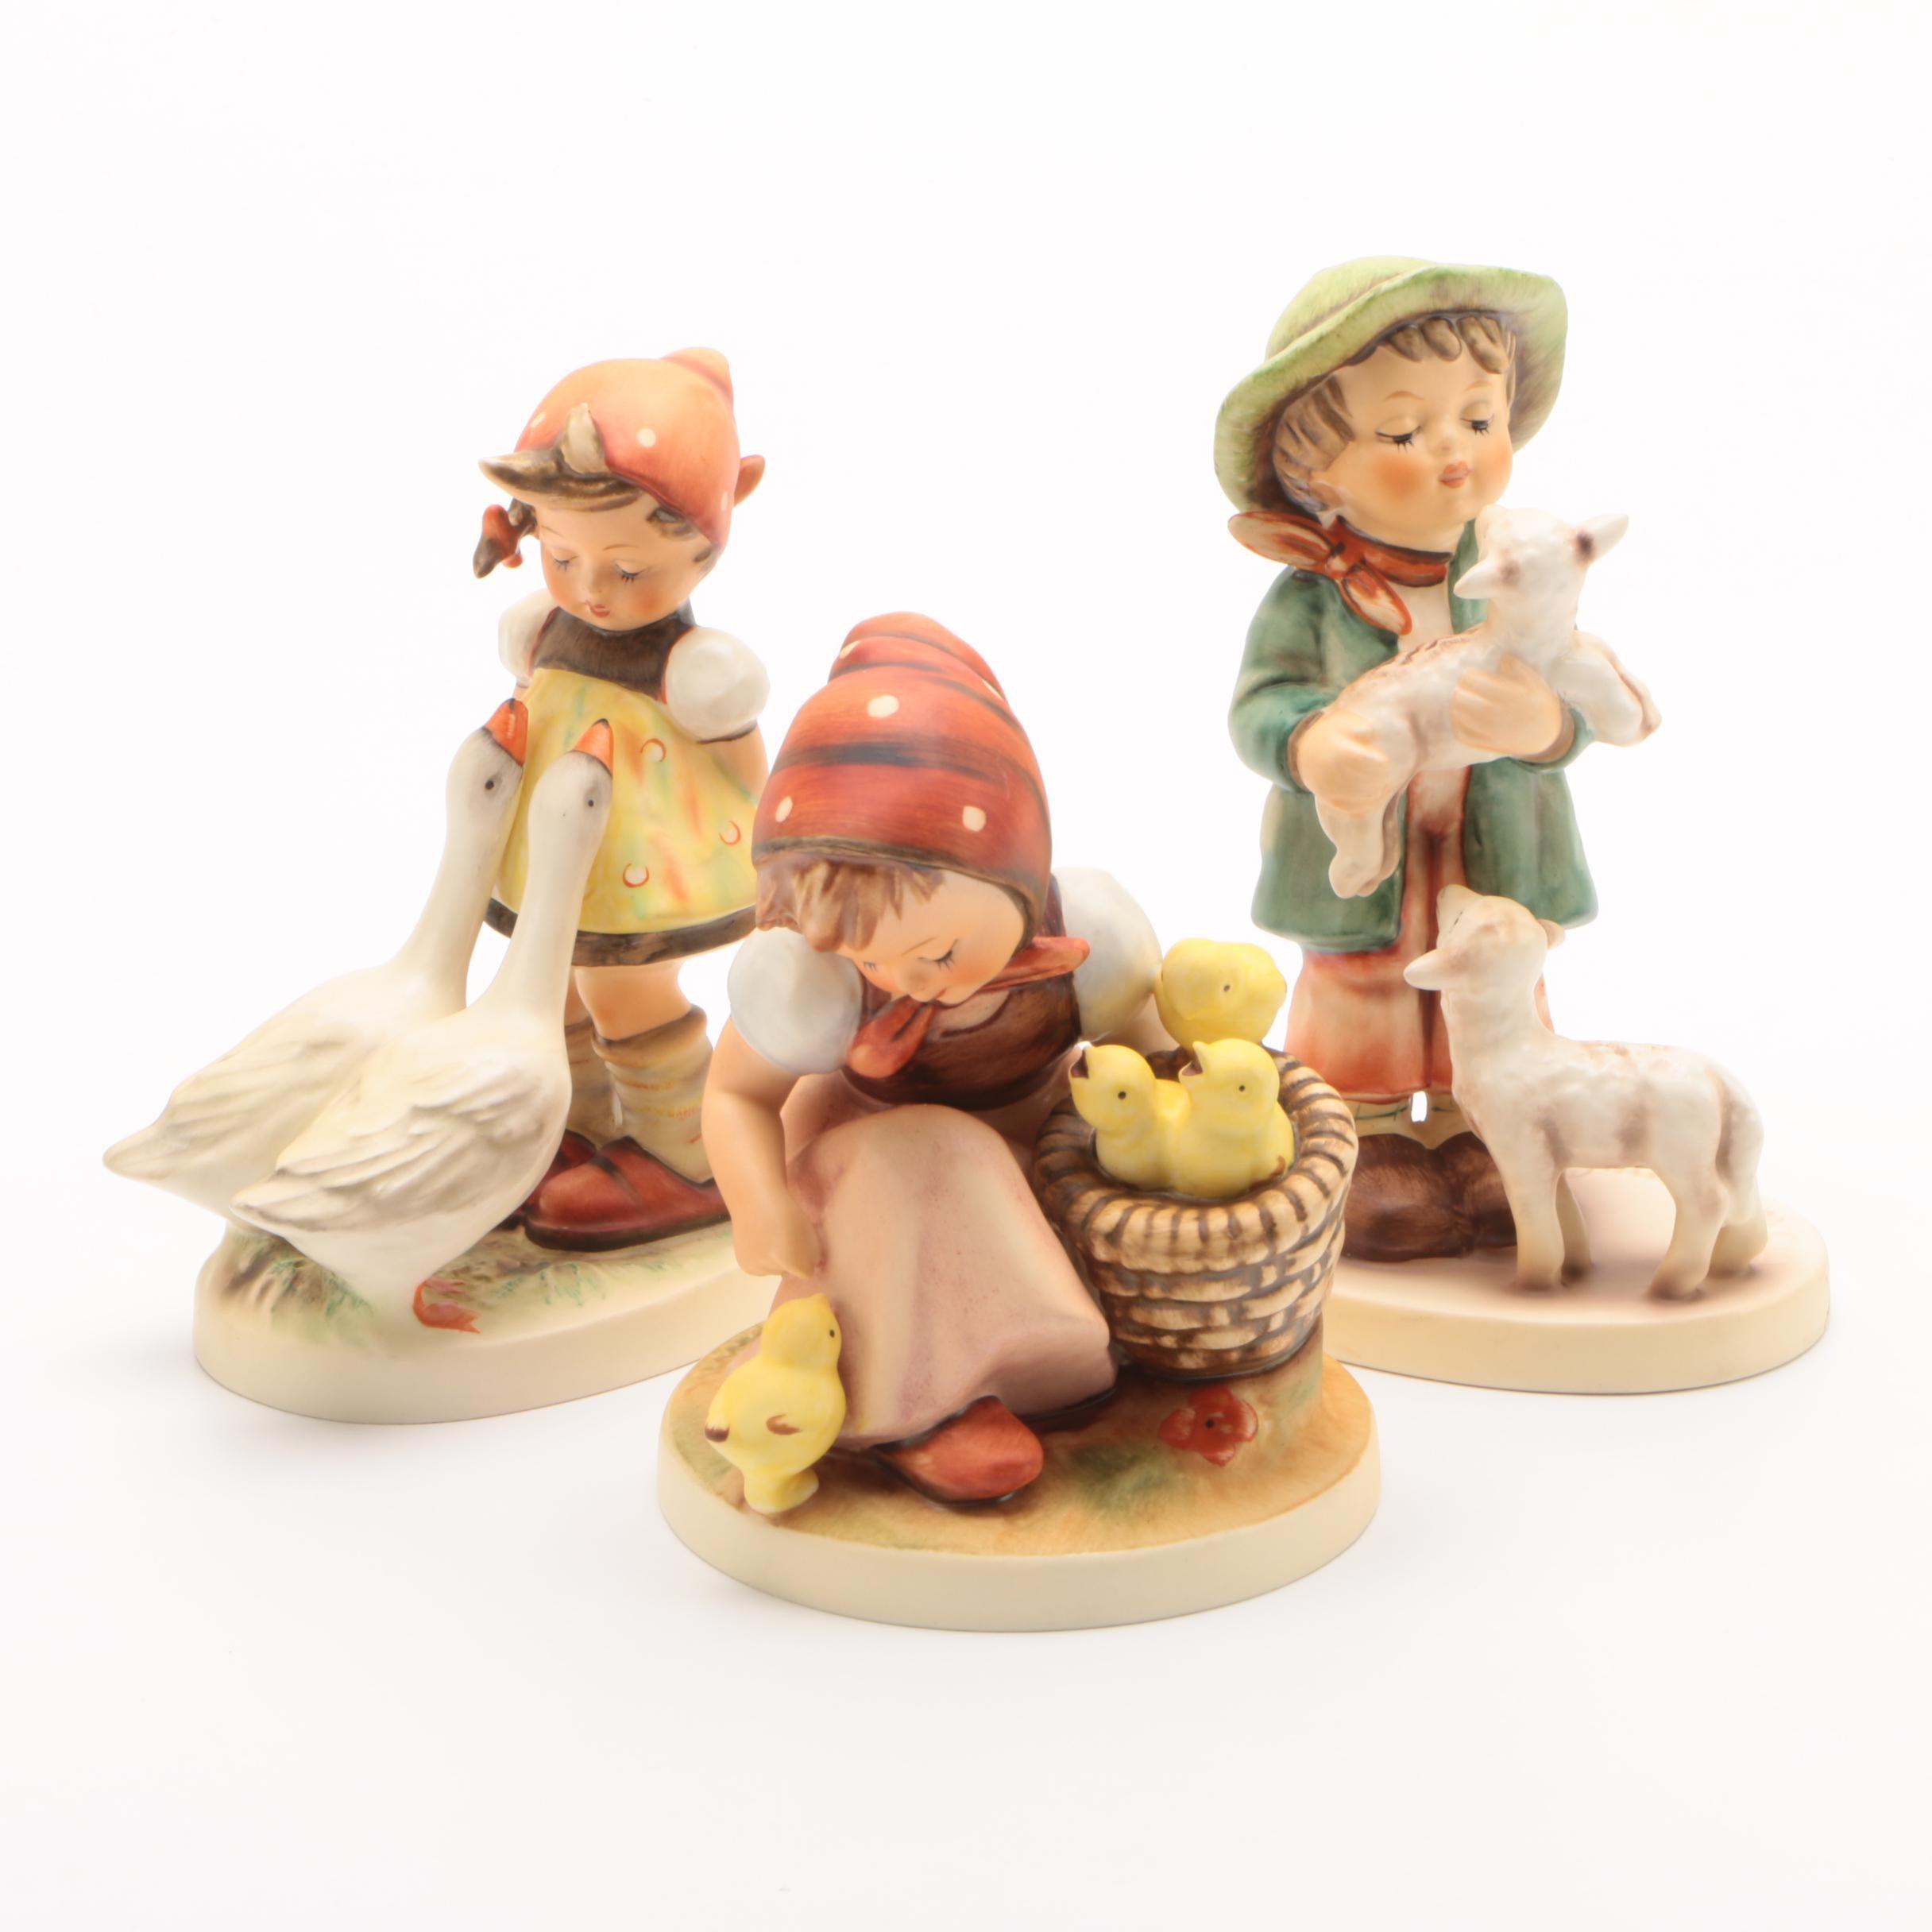 "Hummel Figurines Including ""Goose Girl"", ""Chick Girl"" and ""Shepherd's Boy"""